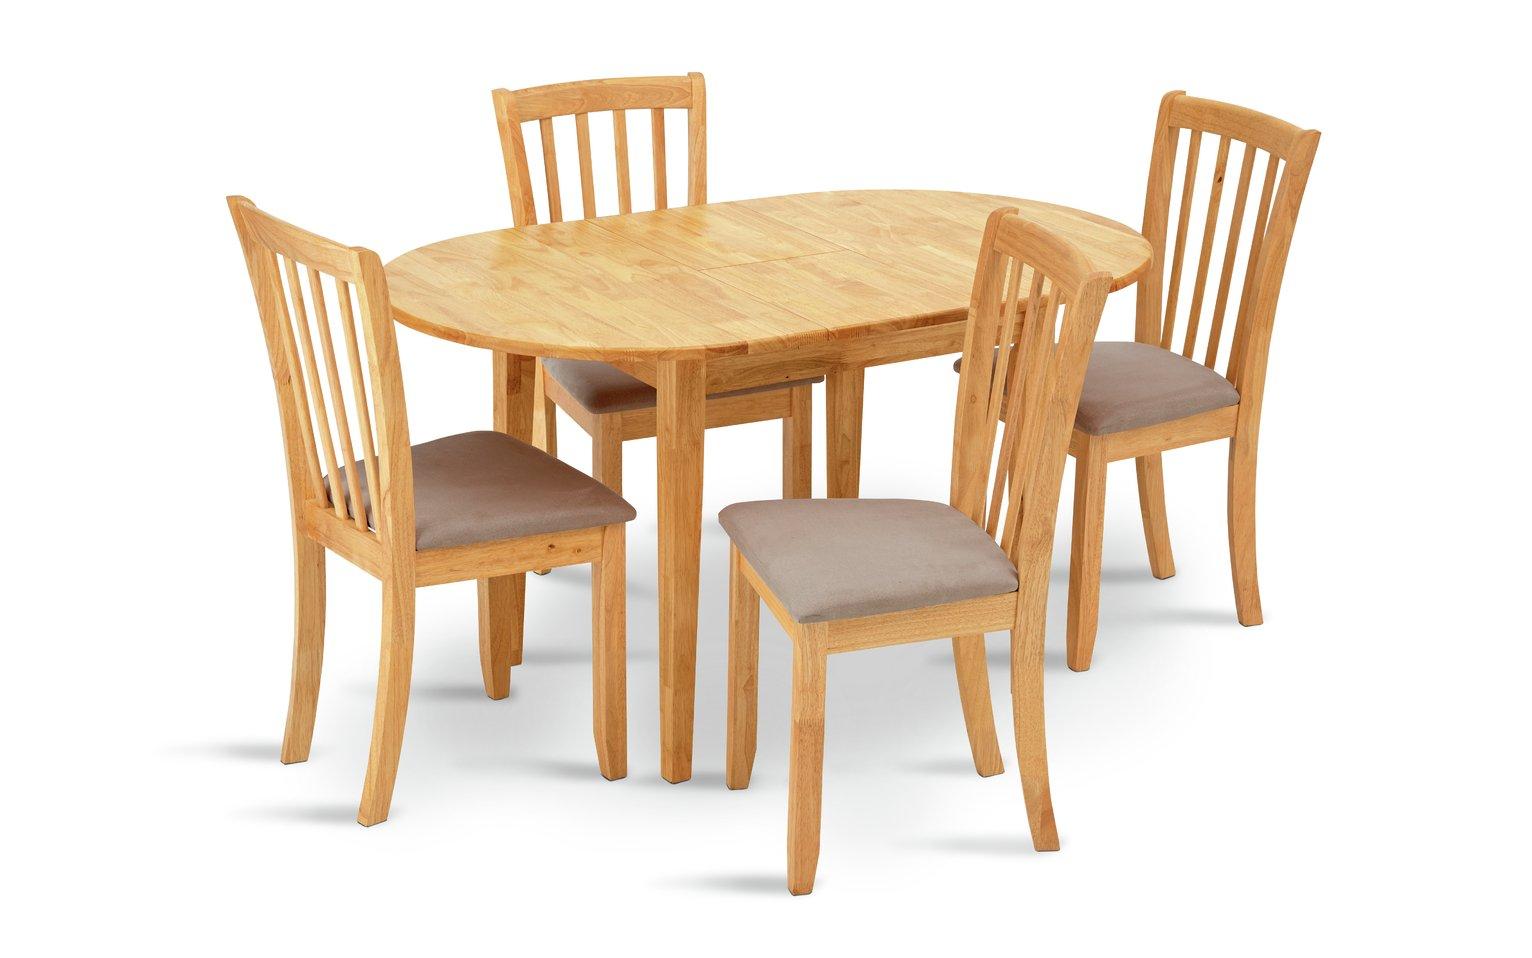 Argos Home Banbury Extendable Table & 4 Chairs - Cream